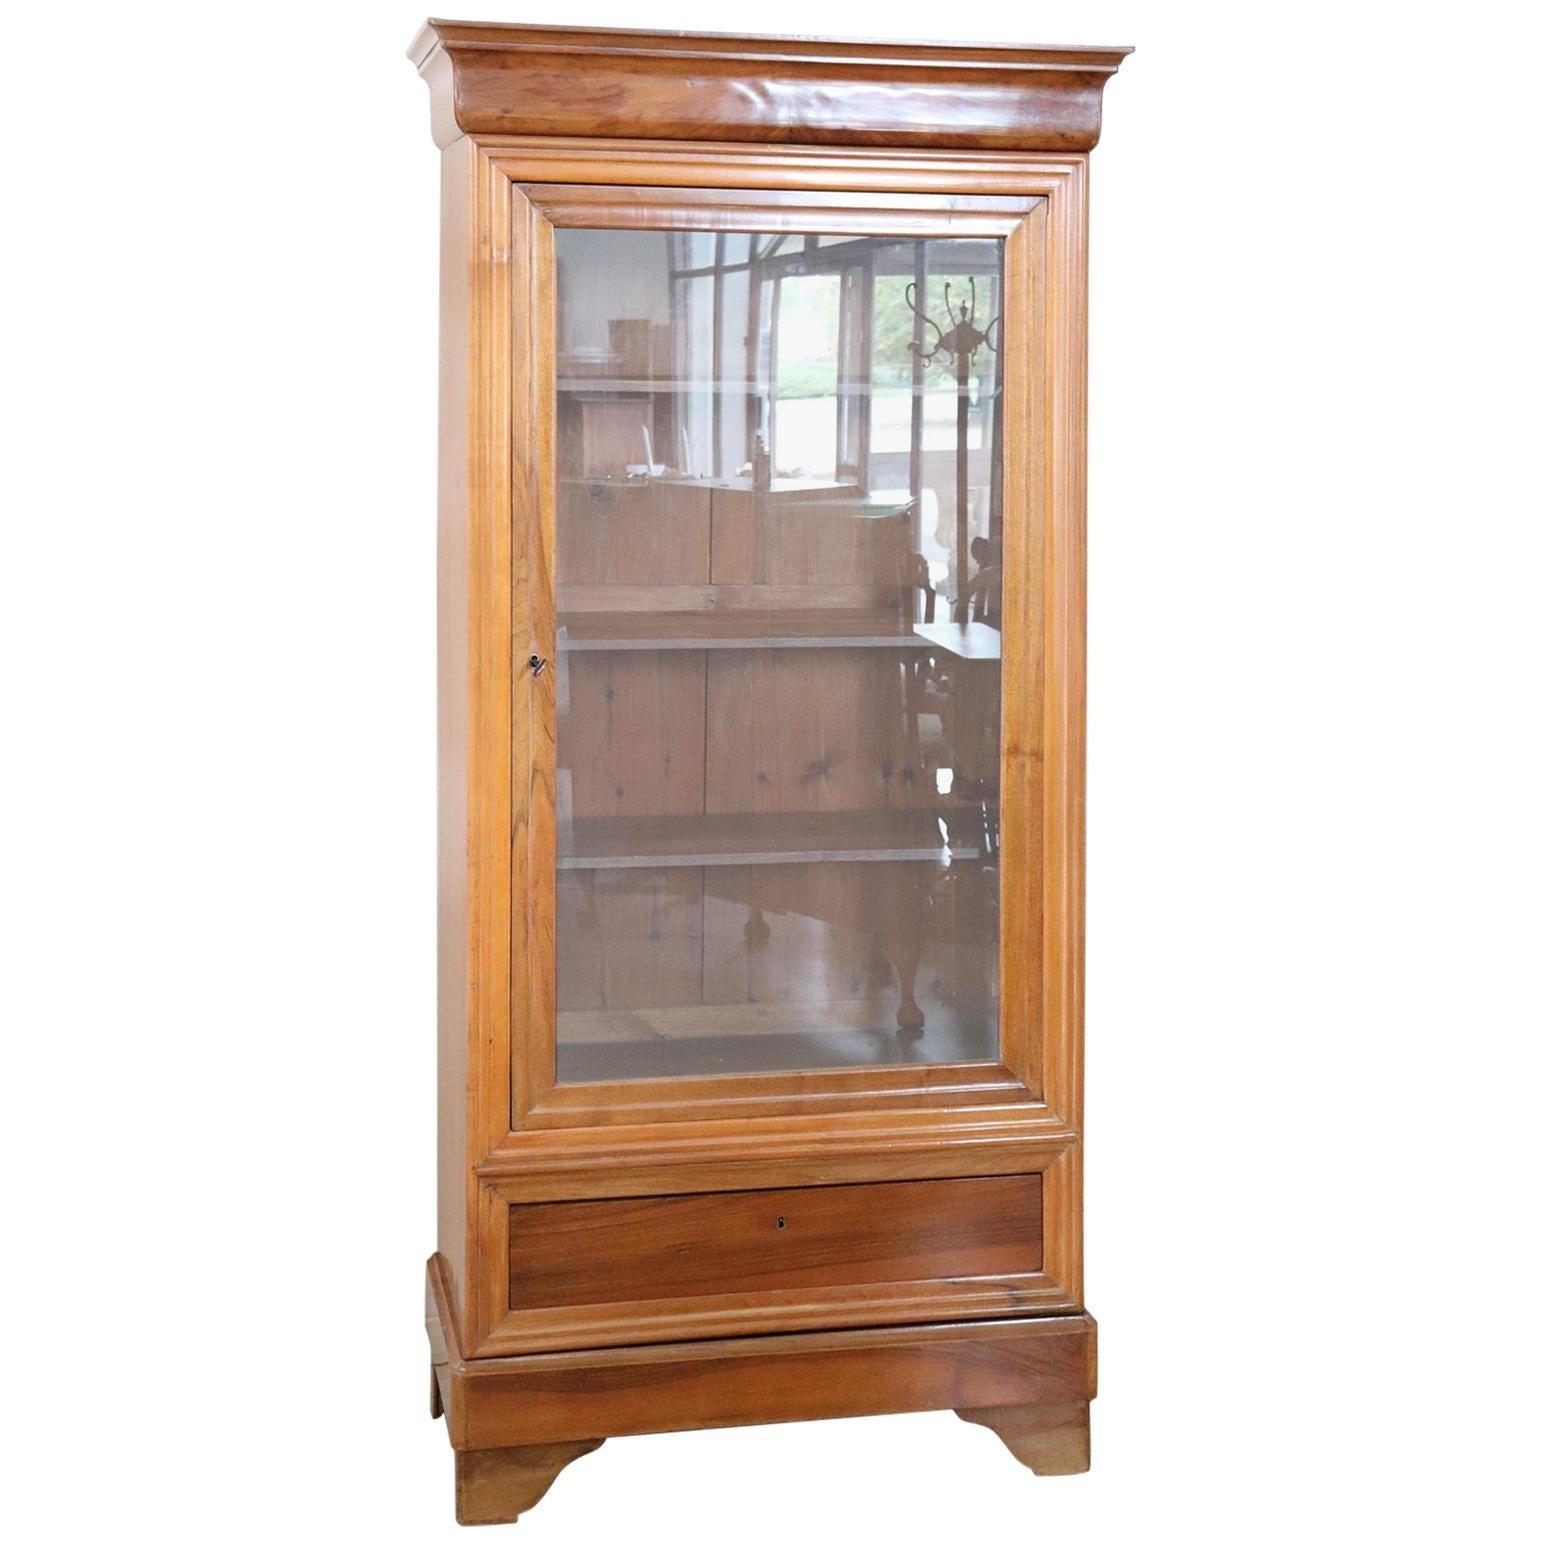 19th Century Antique Solid Walnut Bookcase or Vitrine